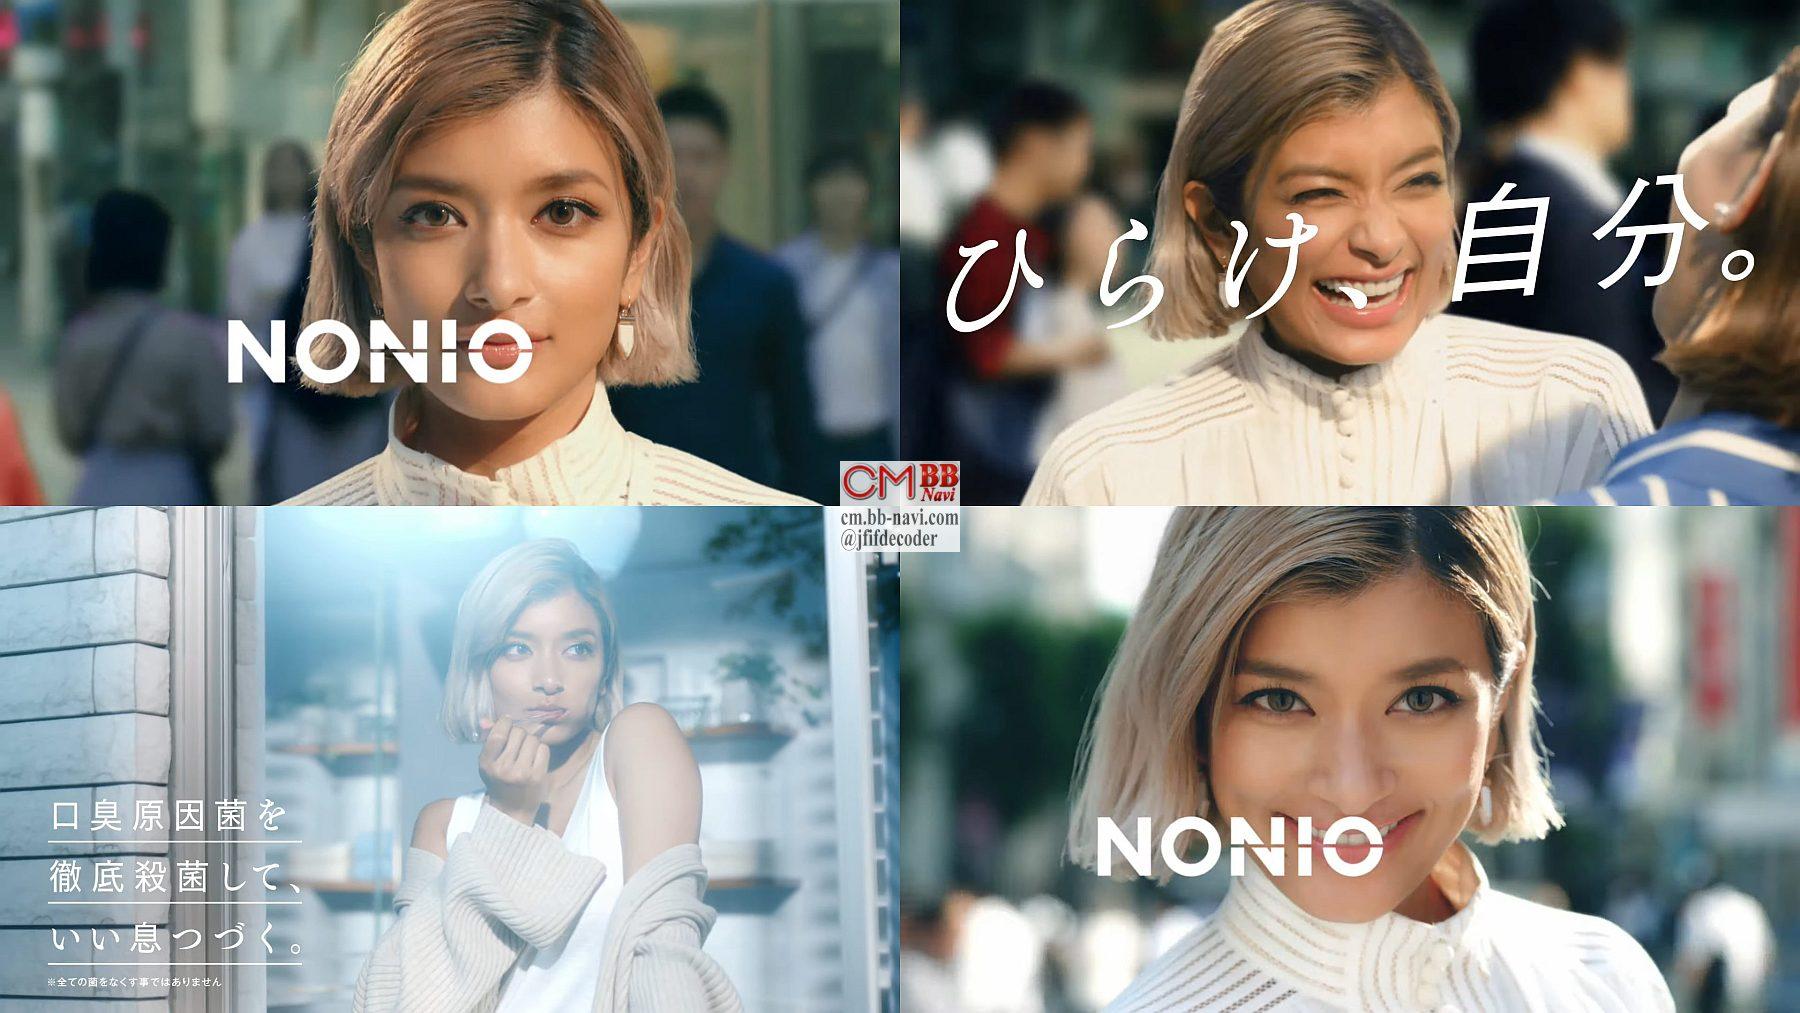 Cm ローラ 歯磨き粉 ローラCMの口臭ケアブランド「NONIO(ノニオ)」とは?使用感は?